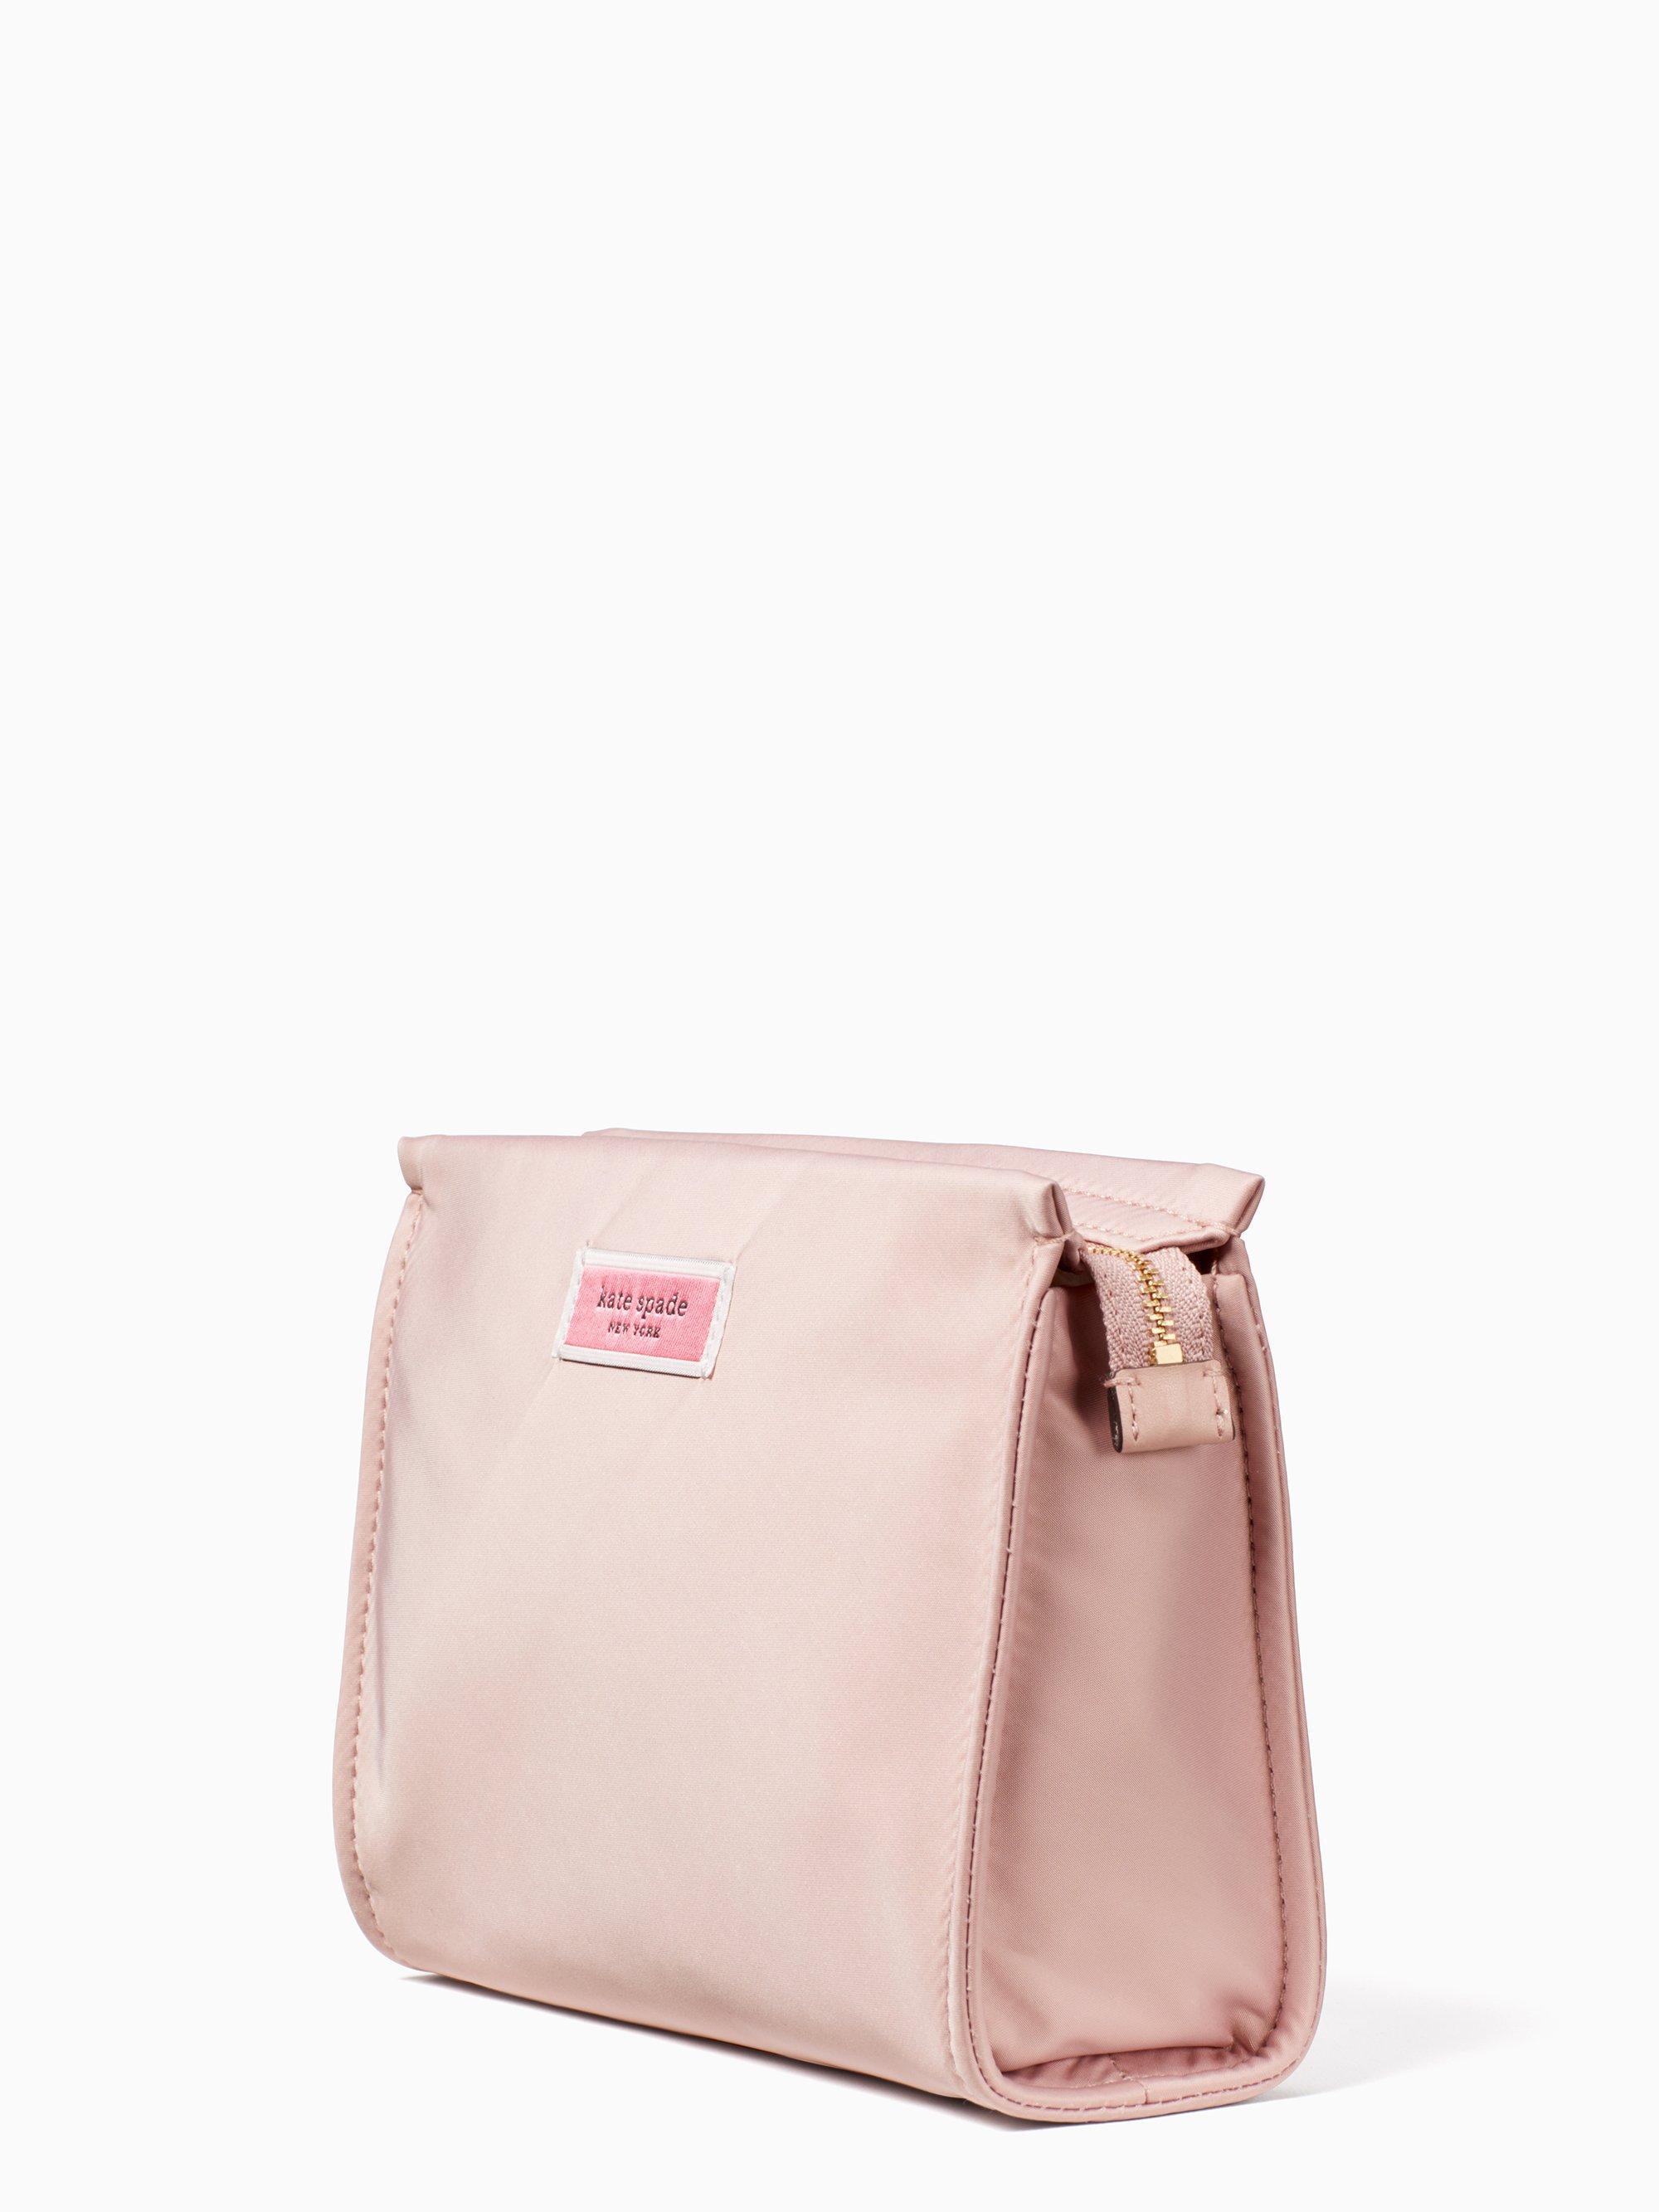 6acfa61584 Lyst - Kate Spade Sam Nylon Medium Cosmetic Bag in Pink - Save 29%